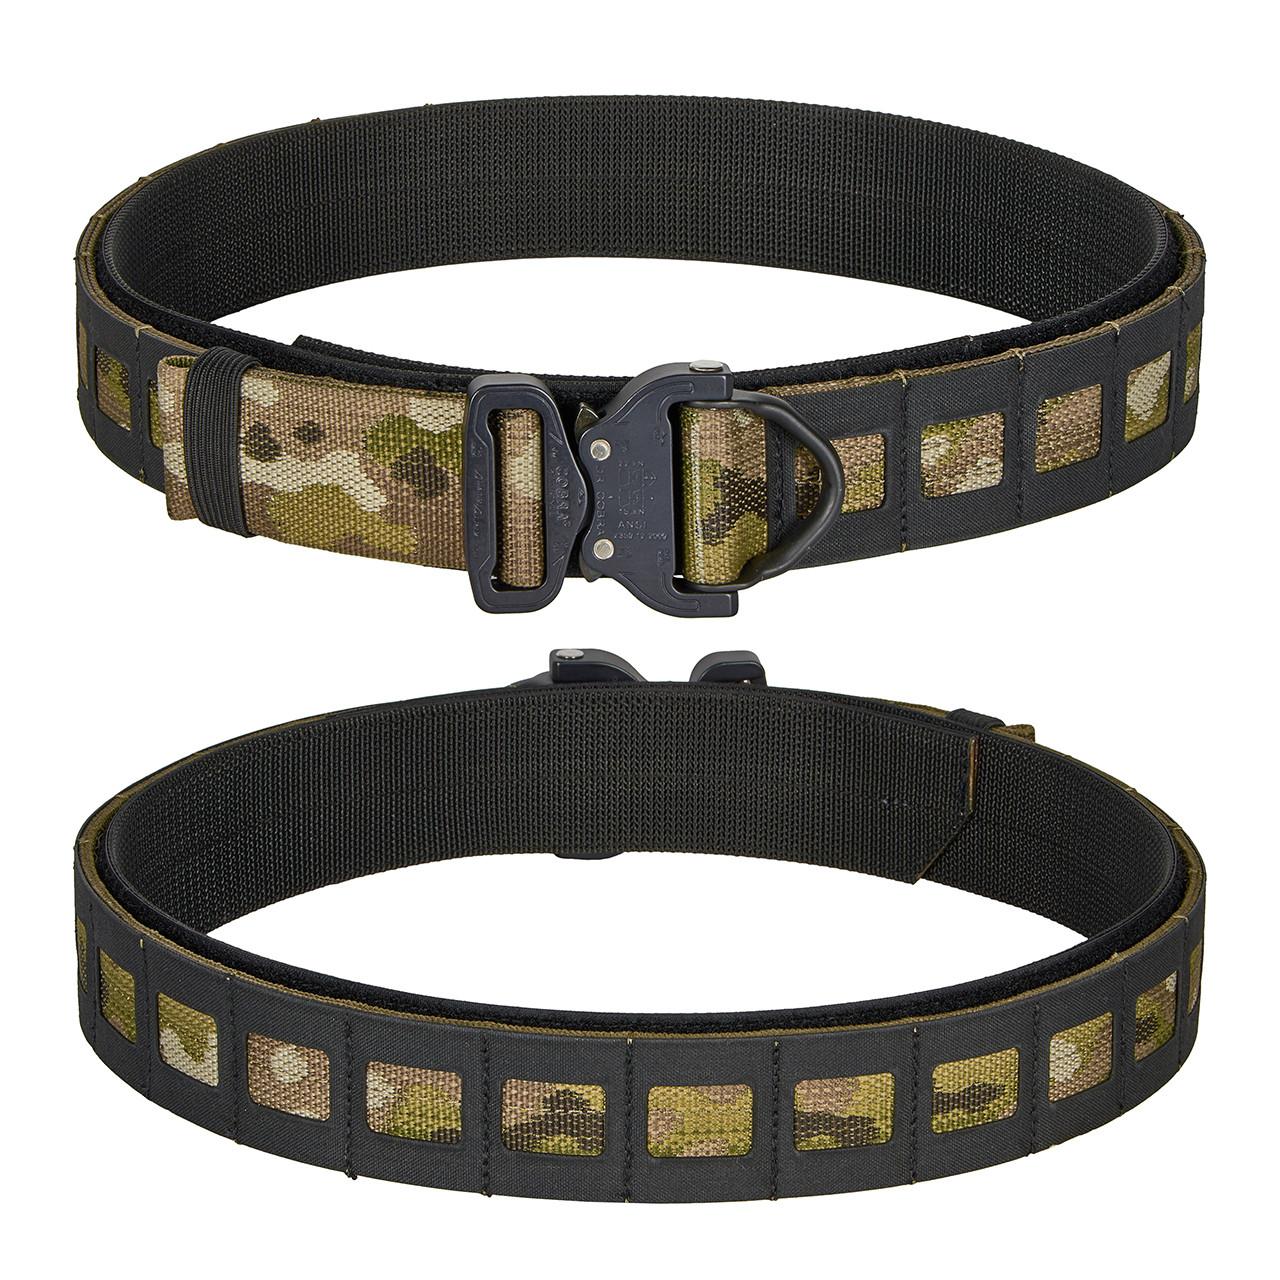 Multicam with Black Composite Material SMU Belt